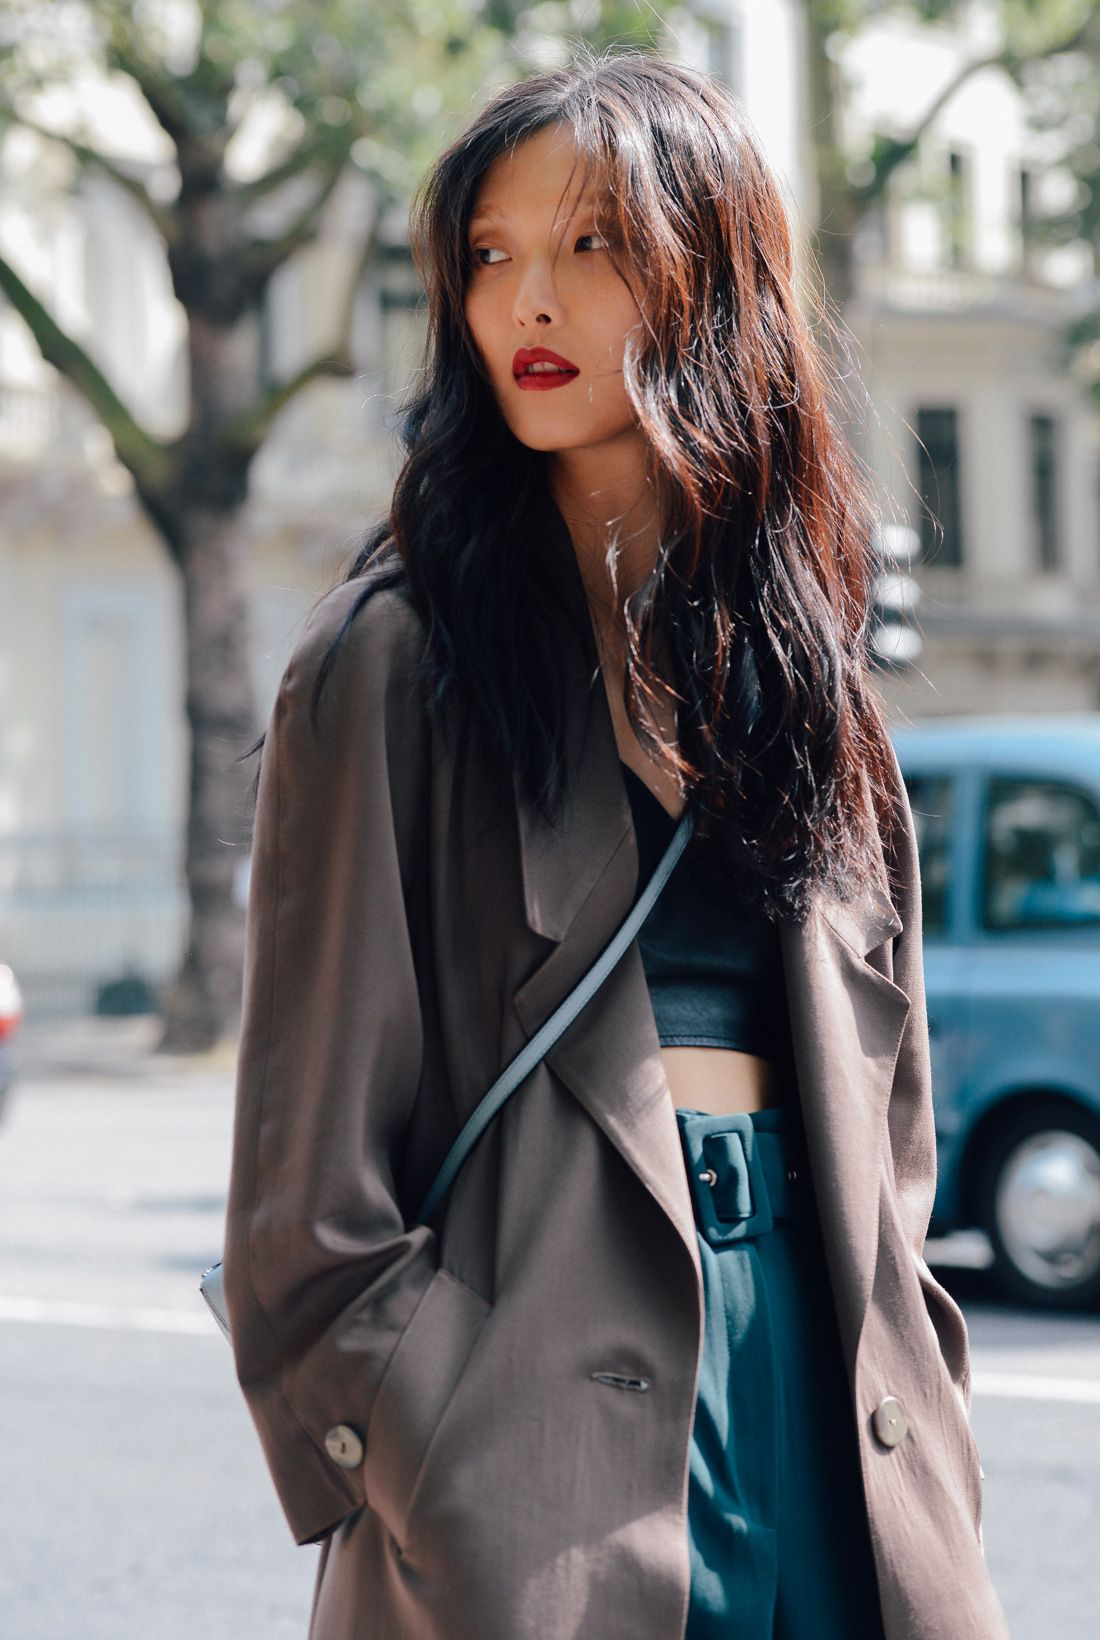 Street Style I fashion I minimalist outfit I kaki silk coat I teal crop top and cross body bag I red lipstick I beauty @monstylepin